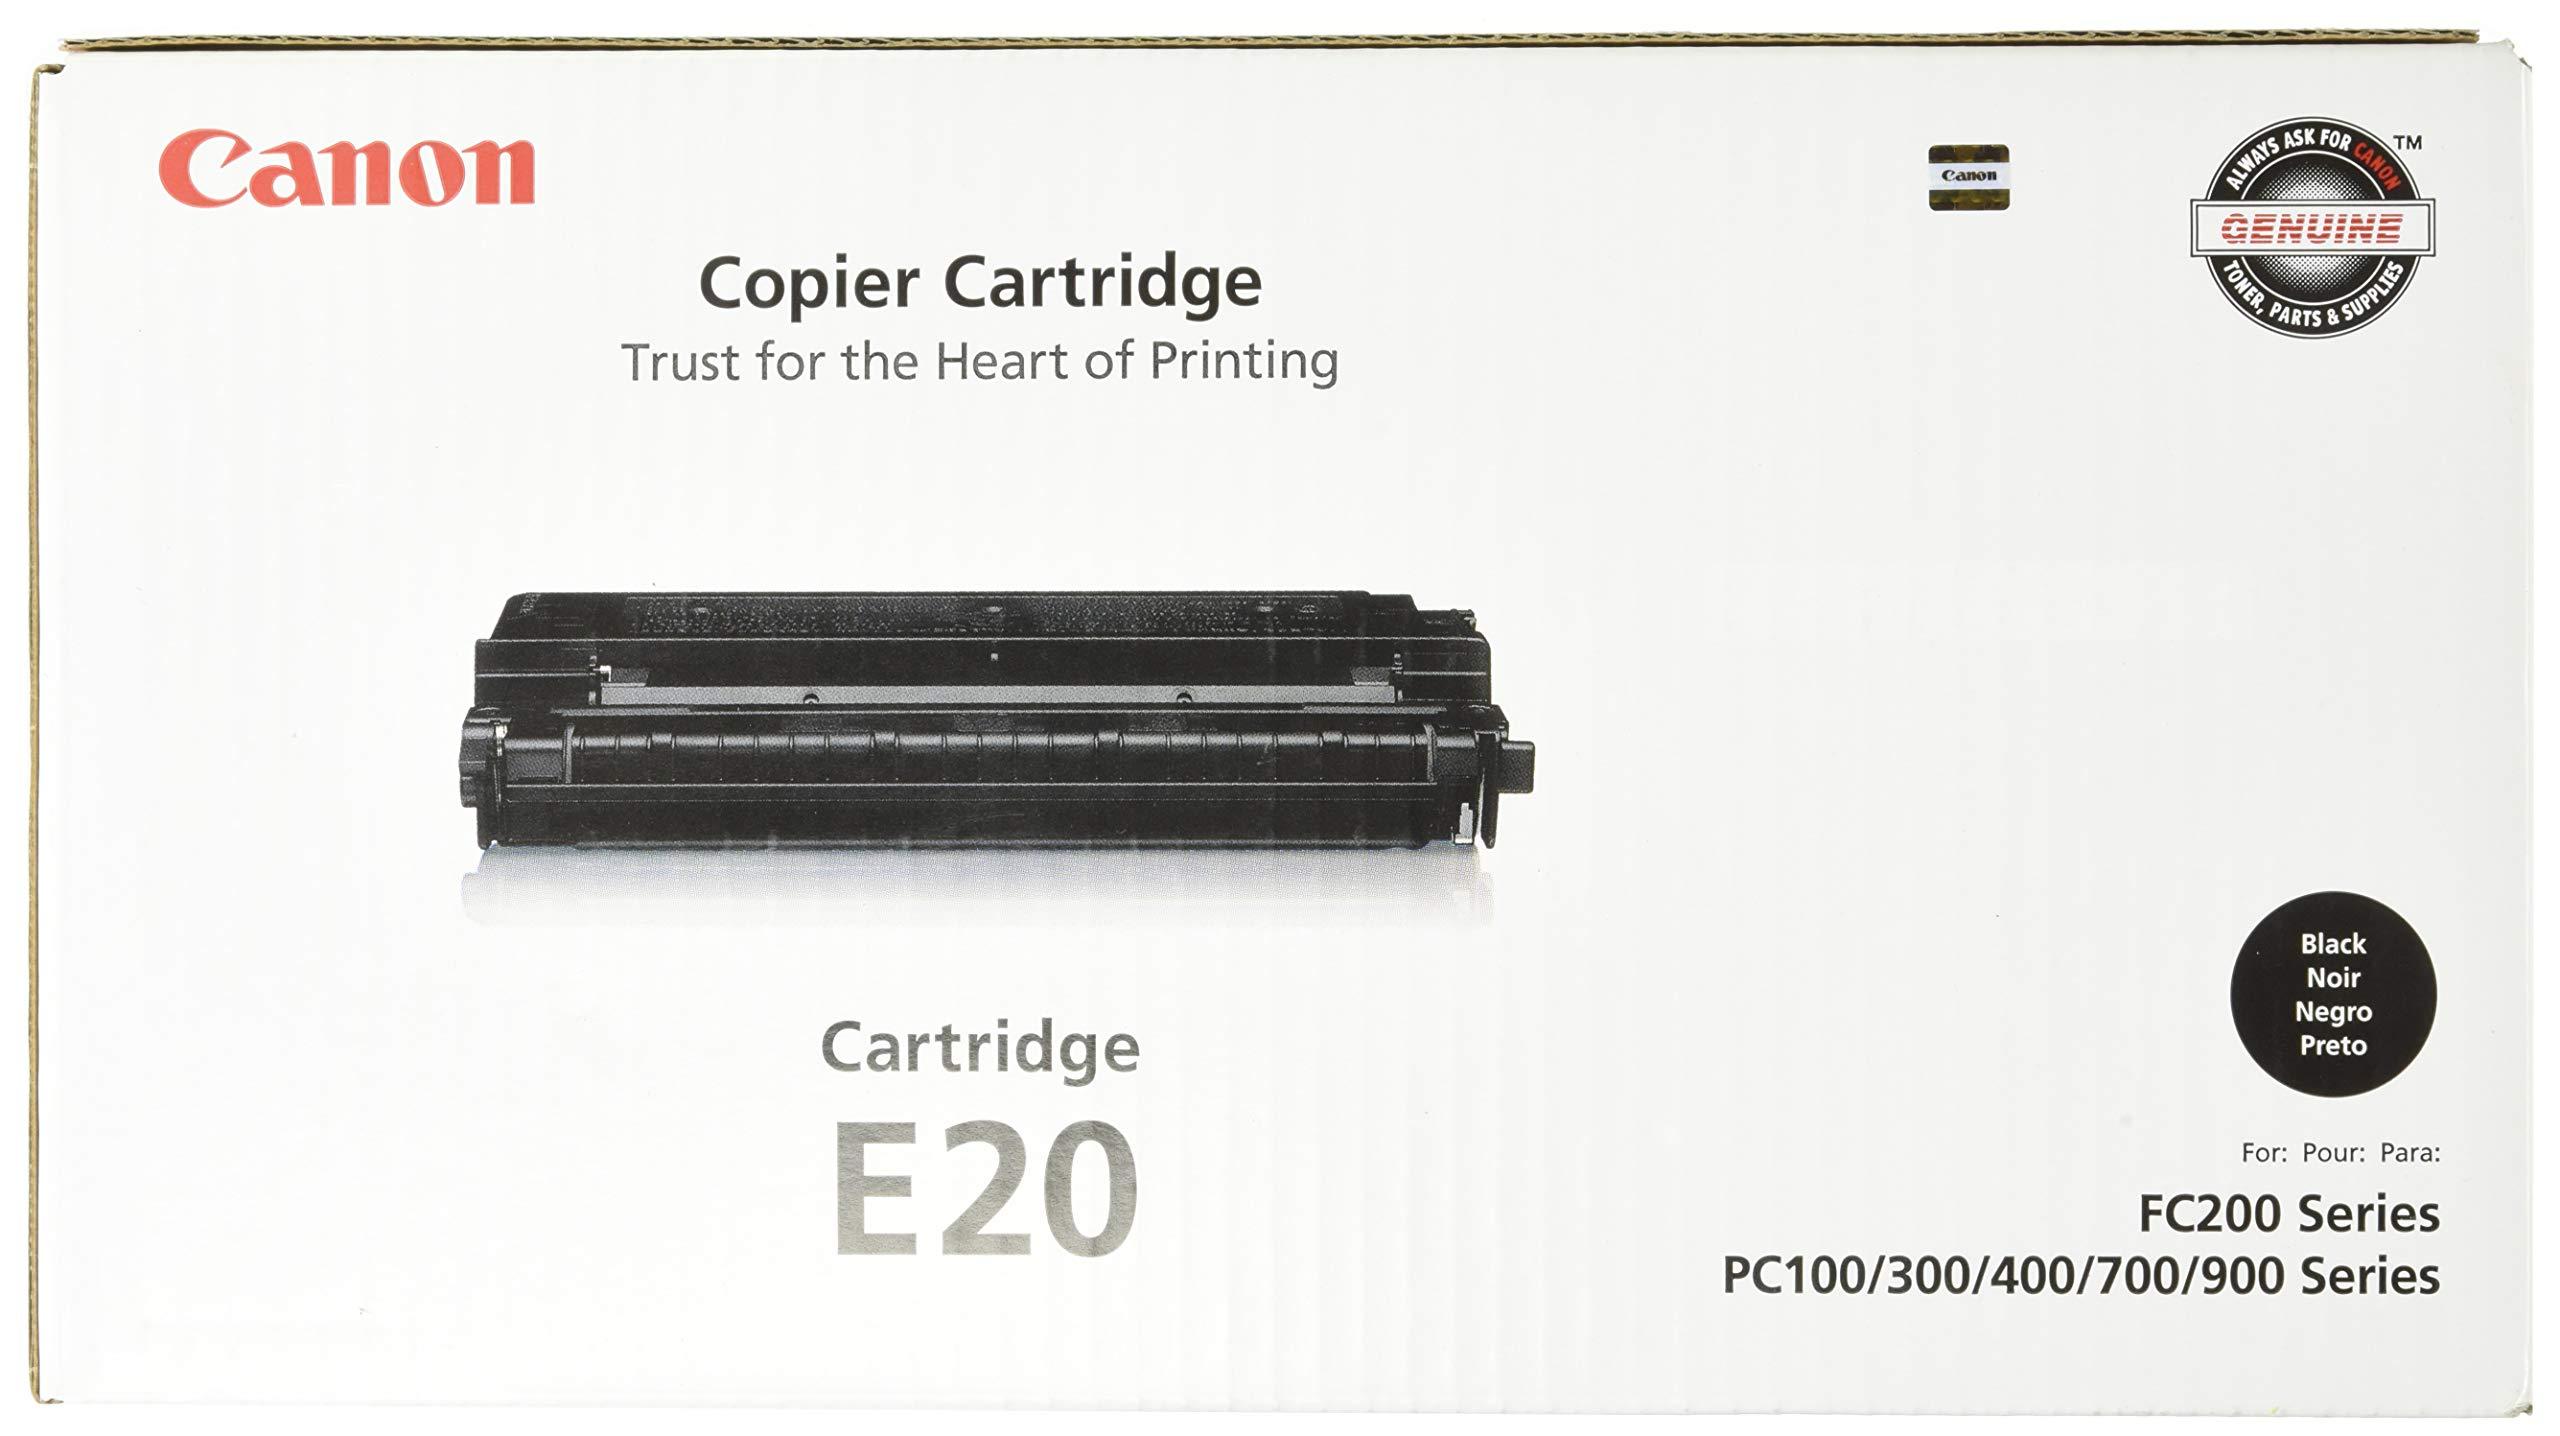 Toner Original CANON E20 (Black 1 Pack)